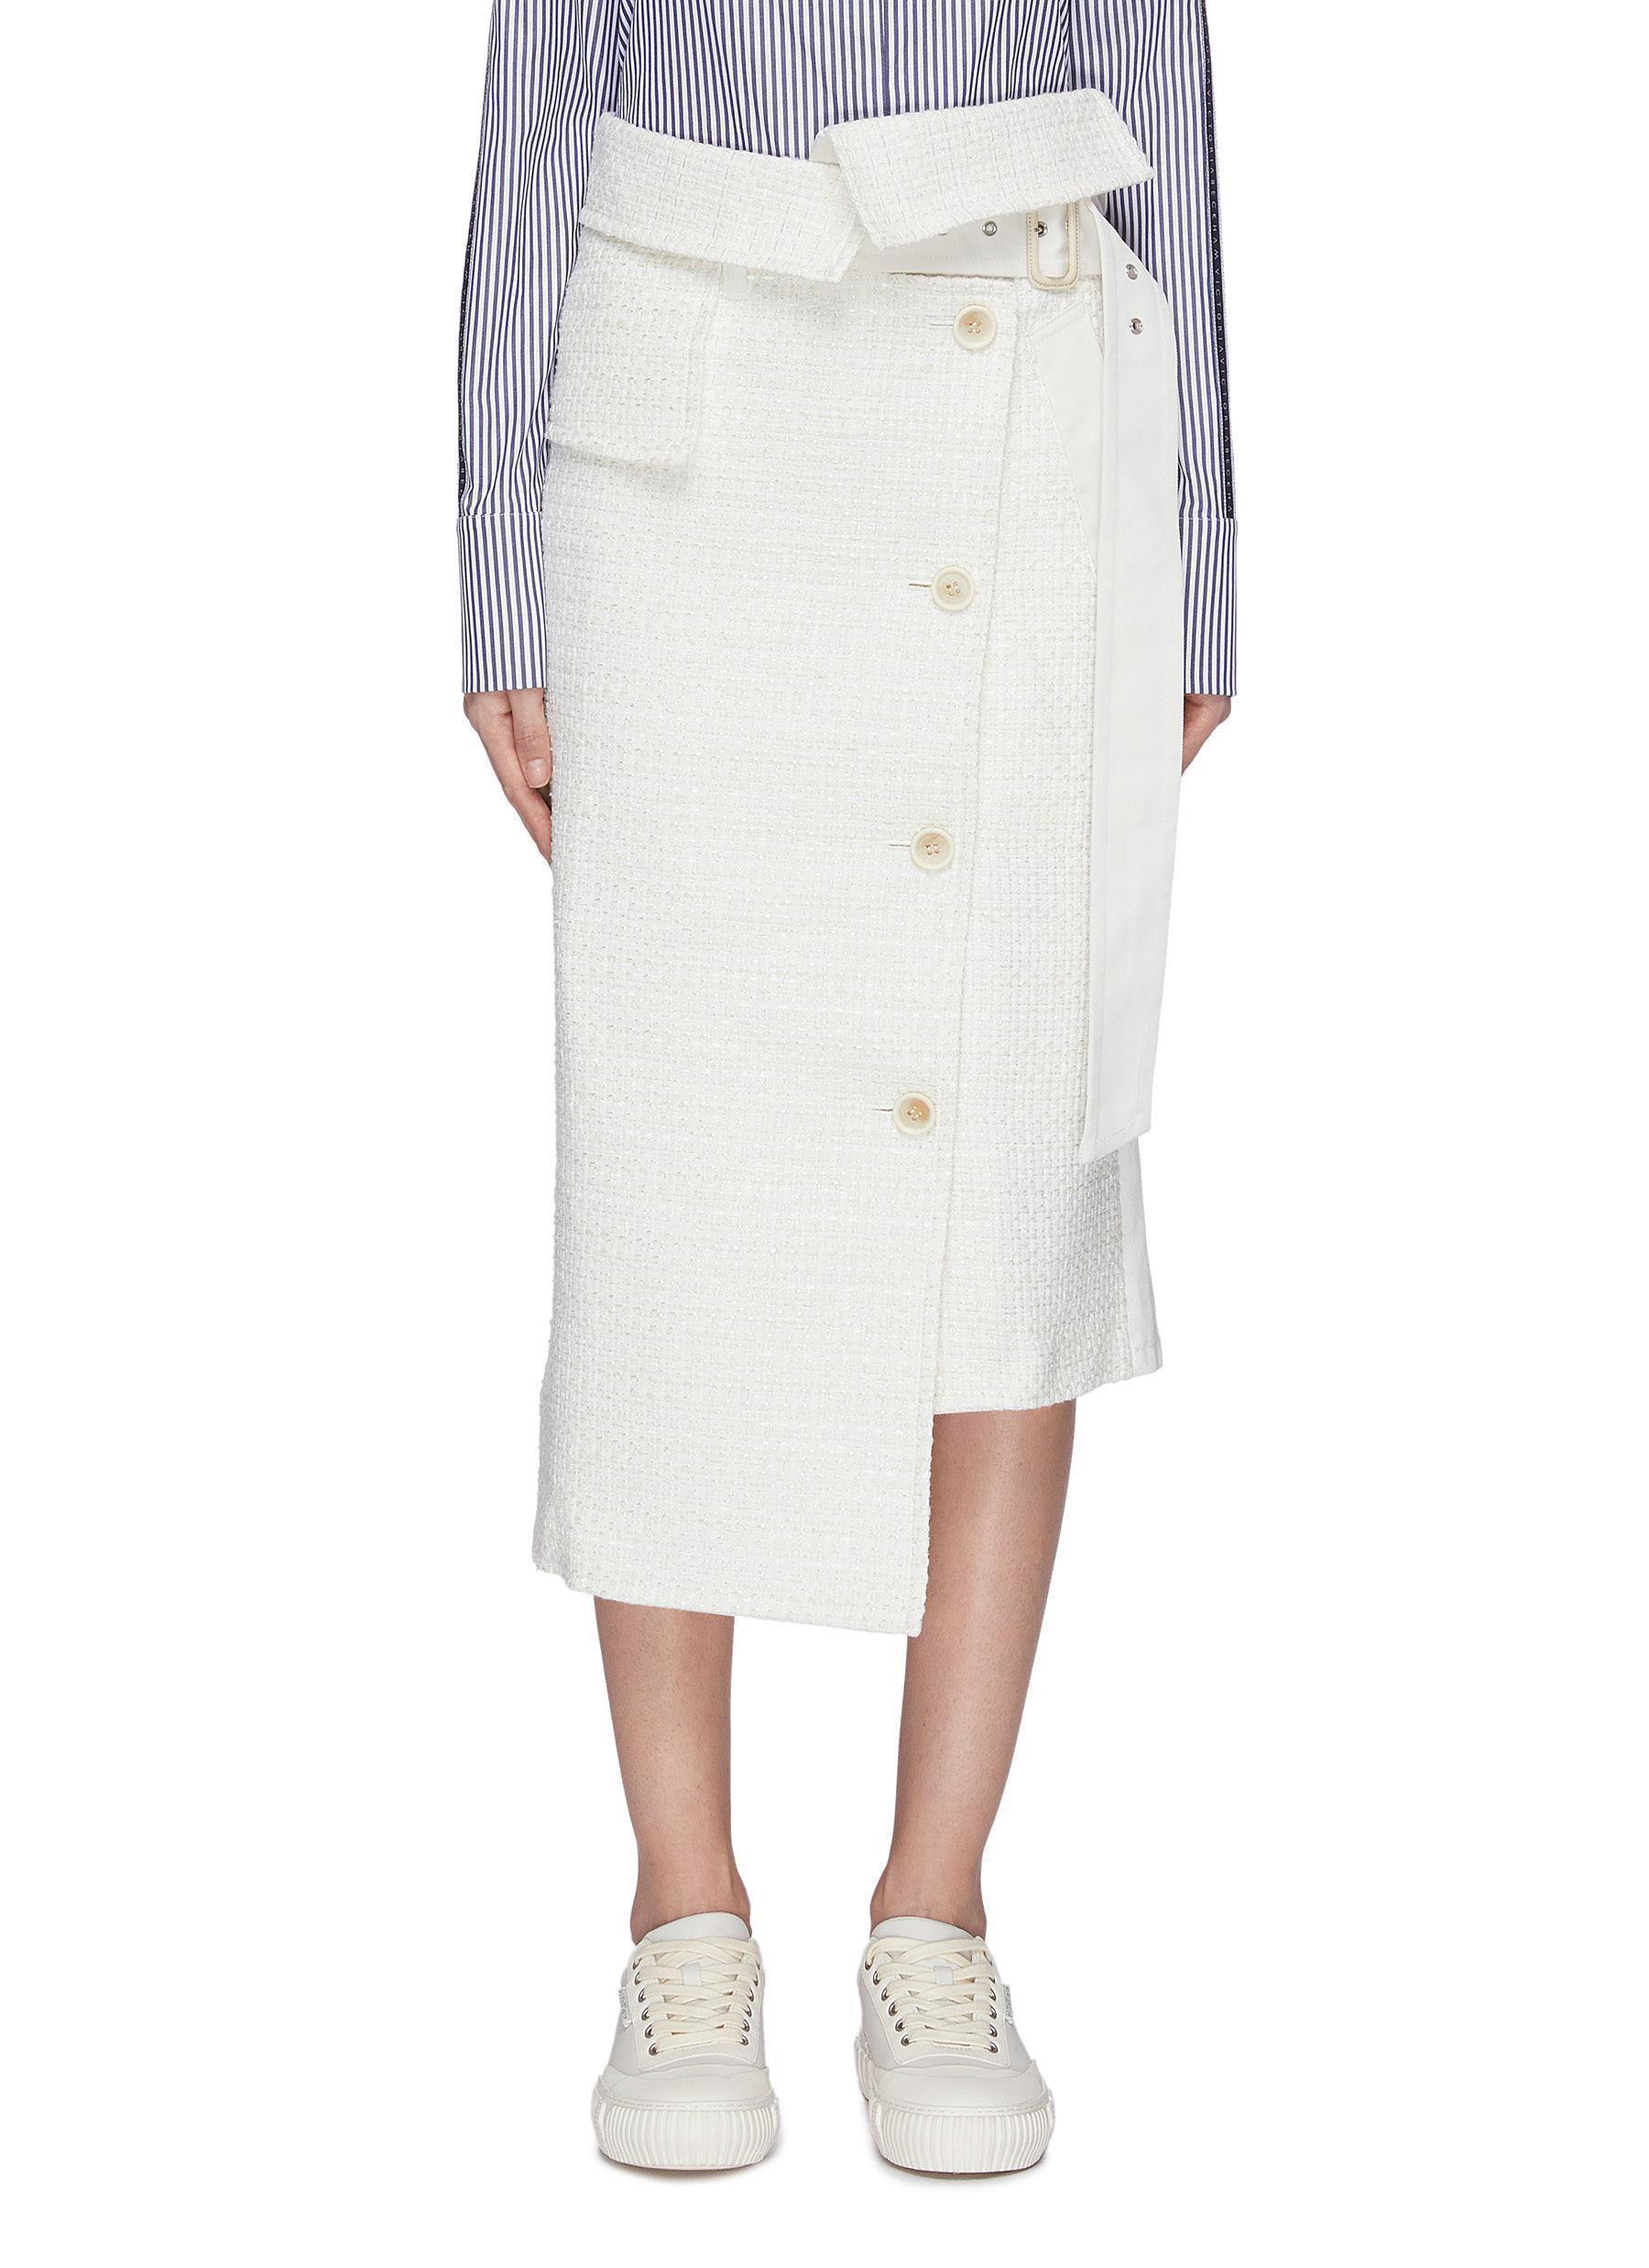 shop The Keiji Denim back asymmetric tweed skirt online